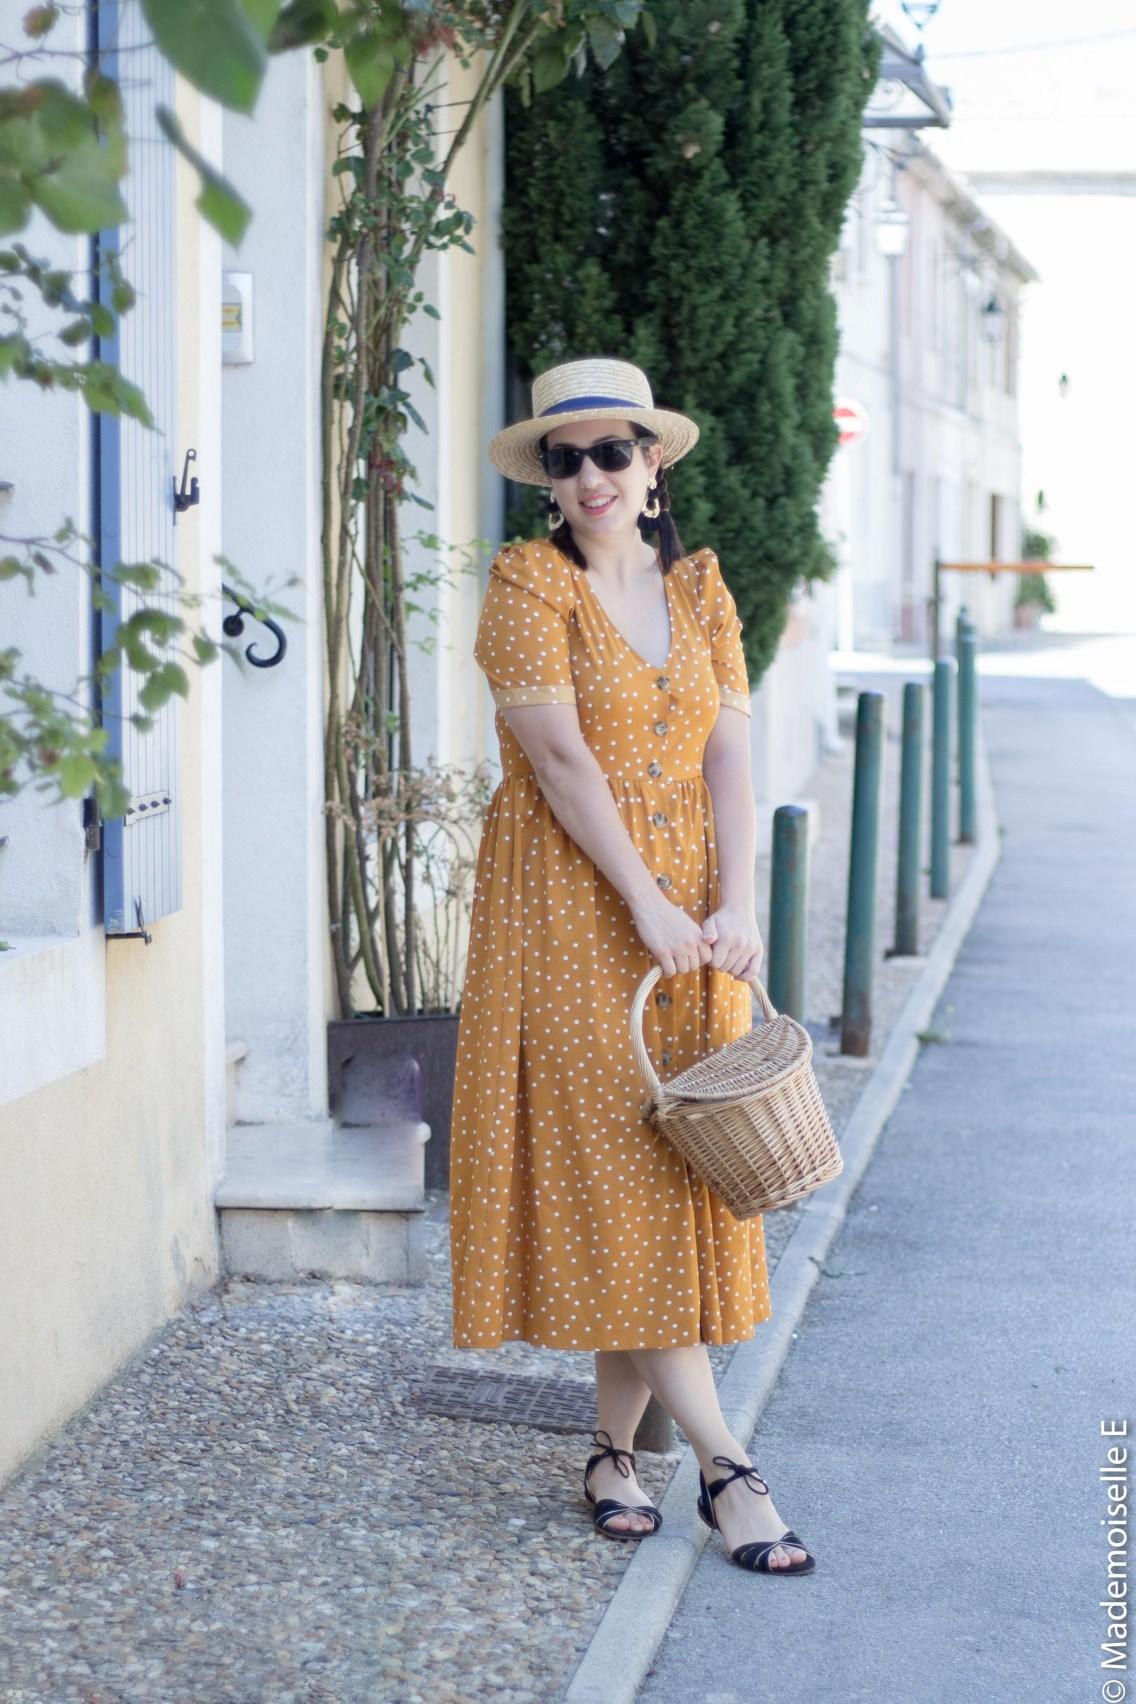 robe pois moutarde tendance été 13 mademoiselle-e